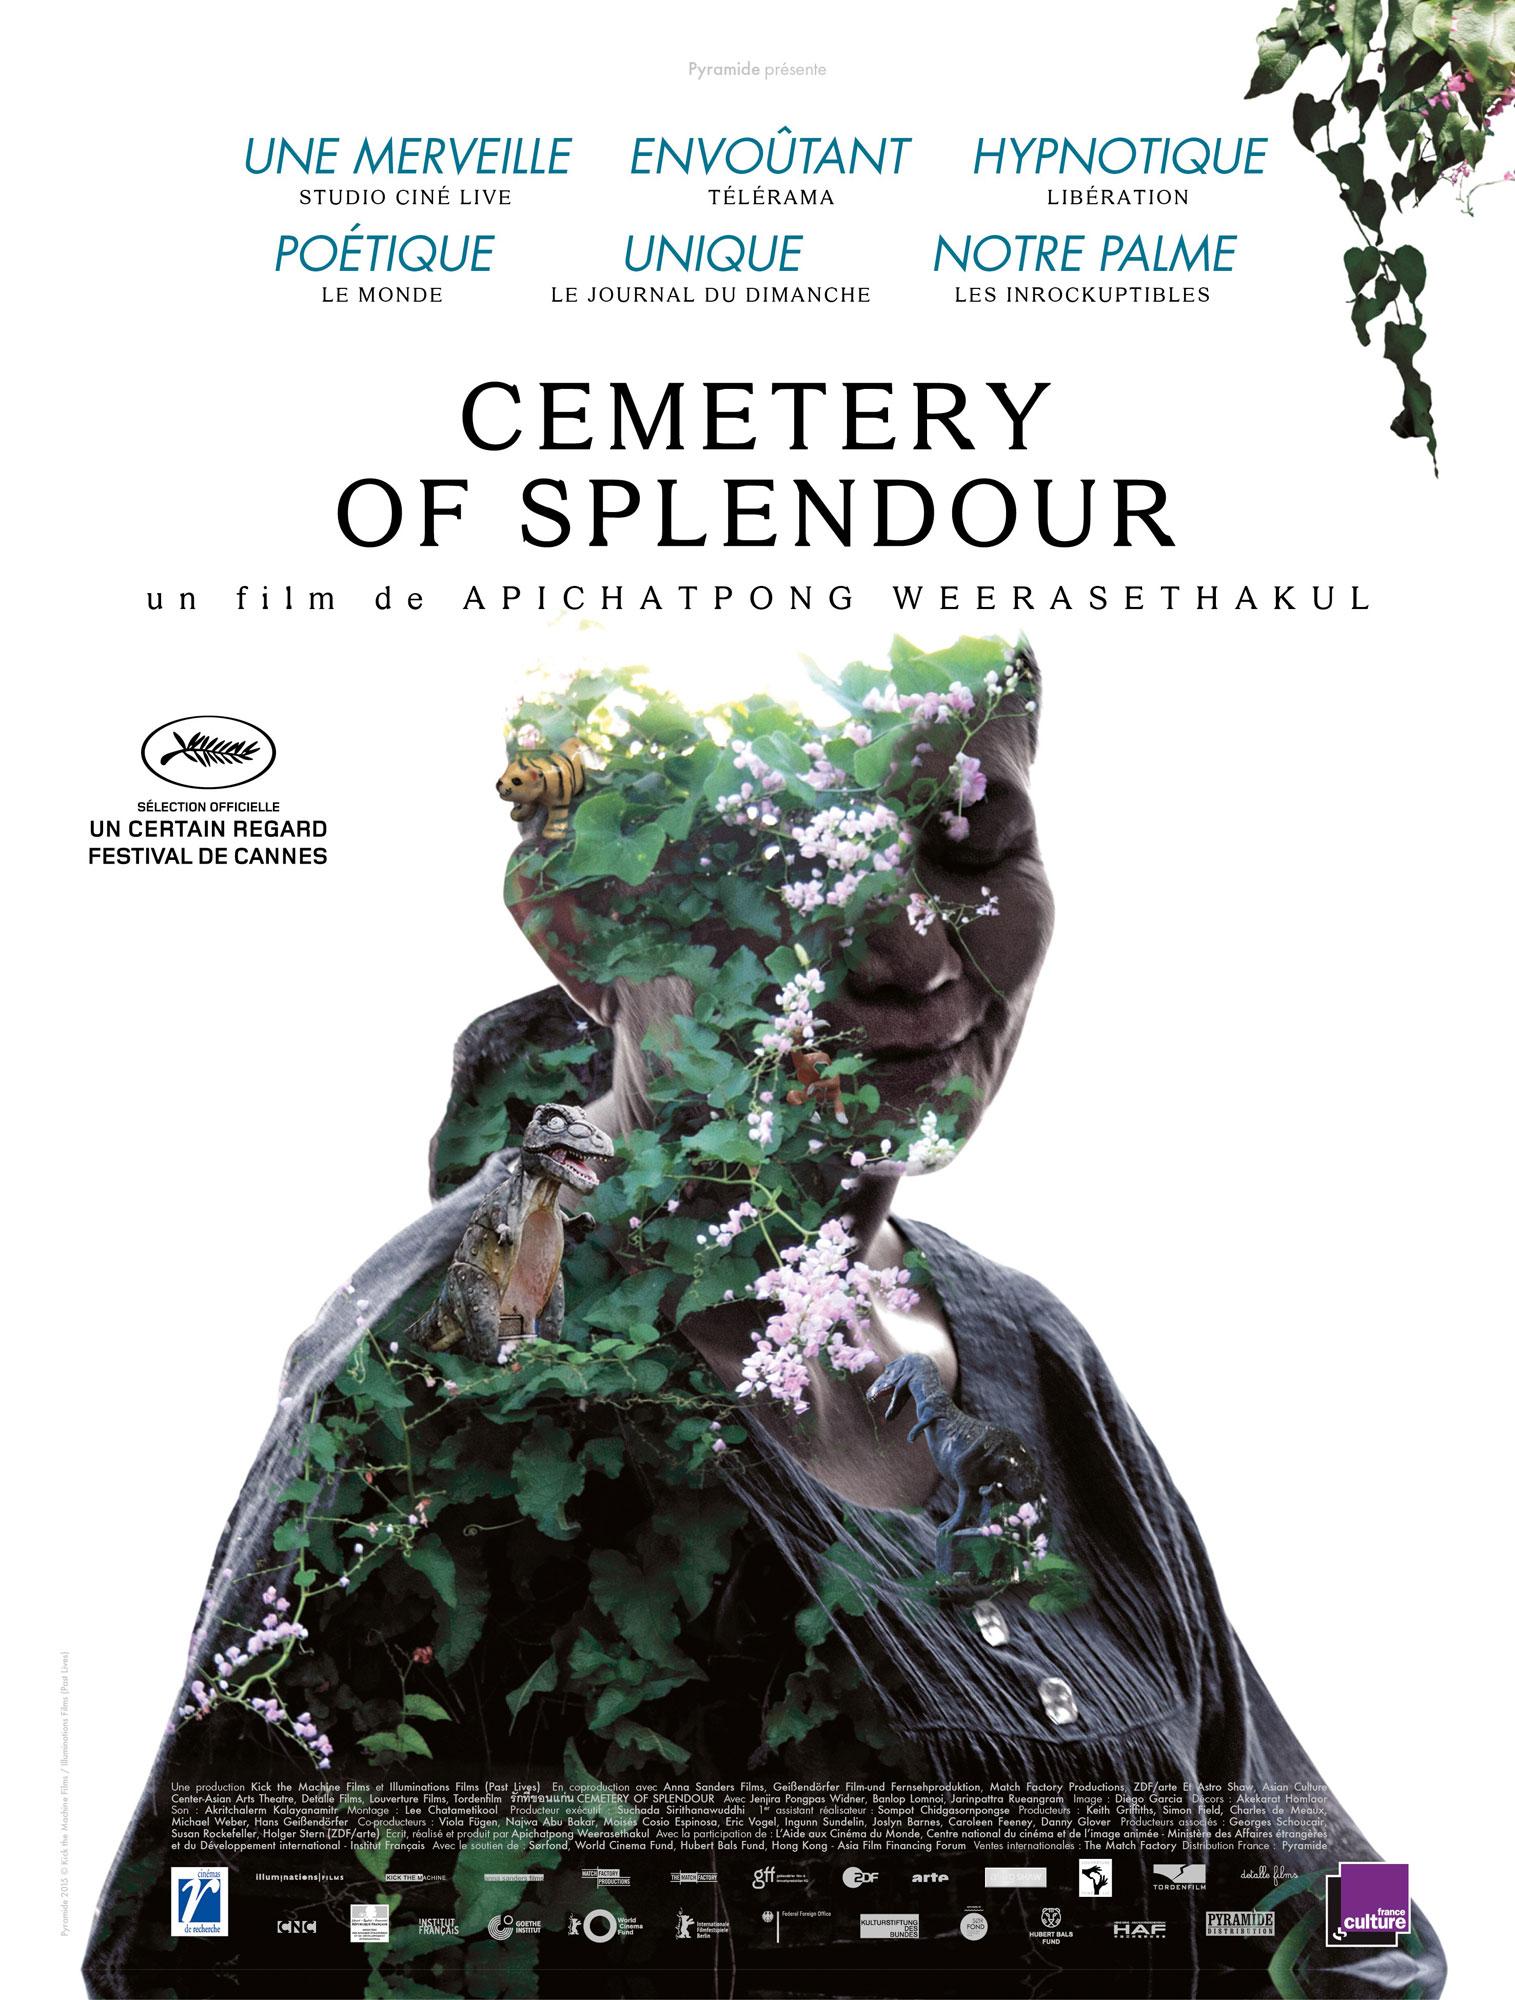 Cemetery of splendour - Affiche